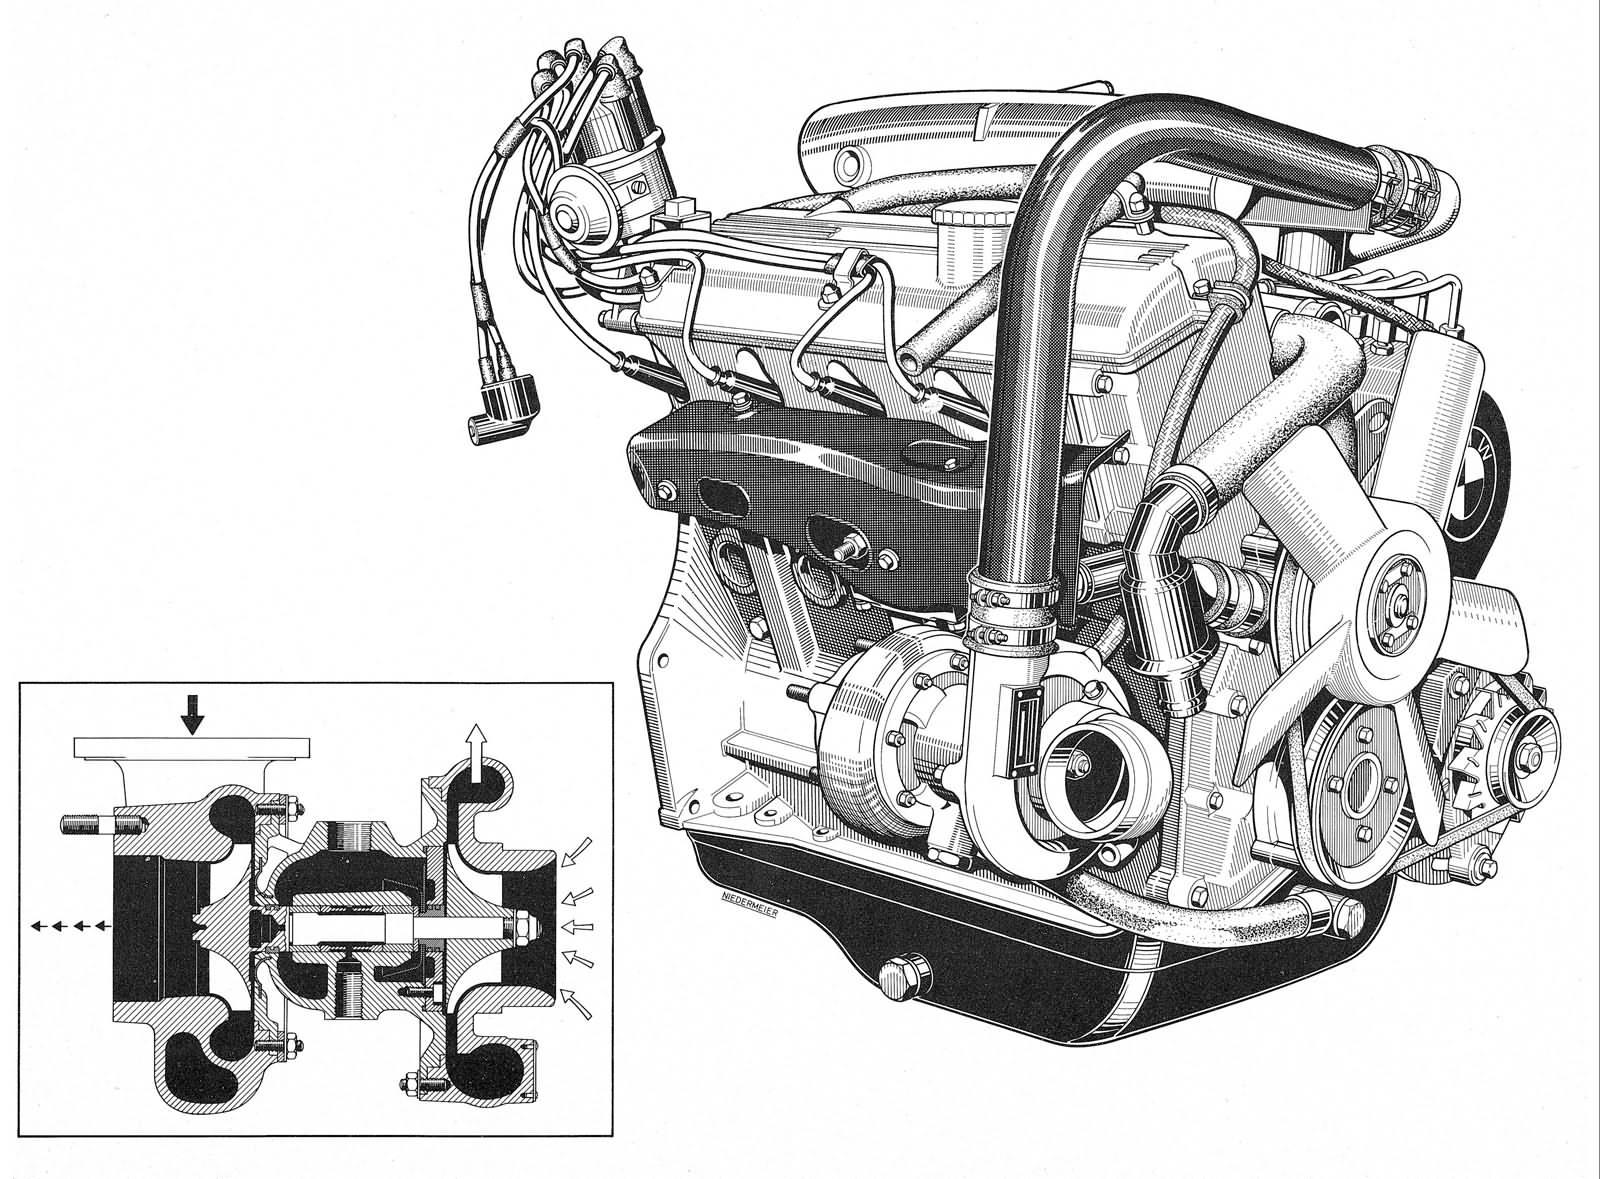 Turbo-Motor vom BMW 2002 turbo